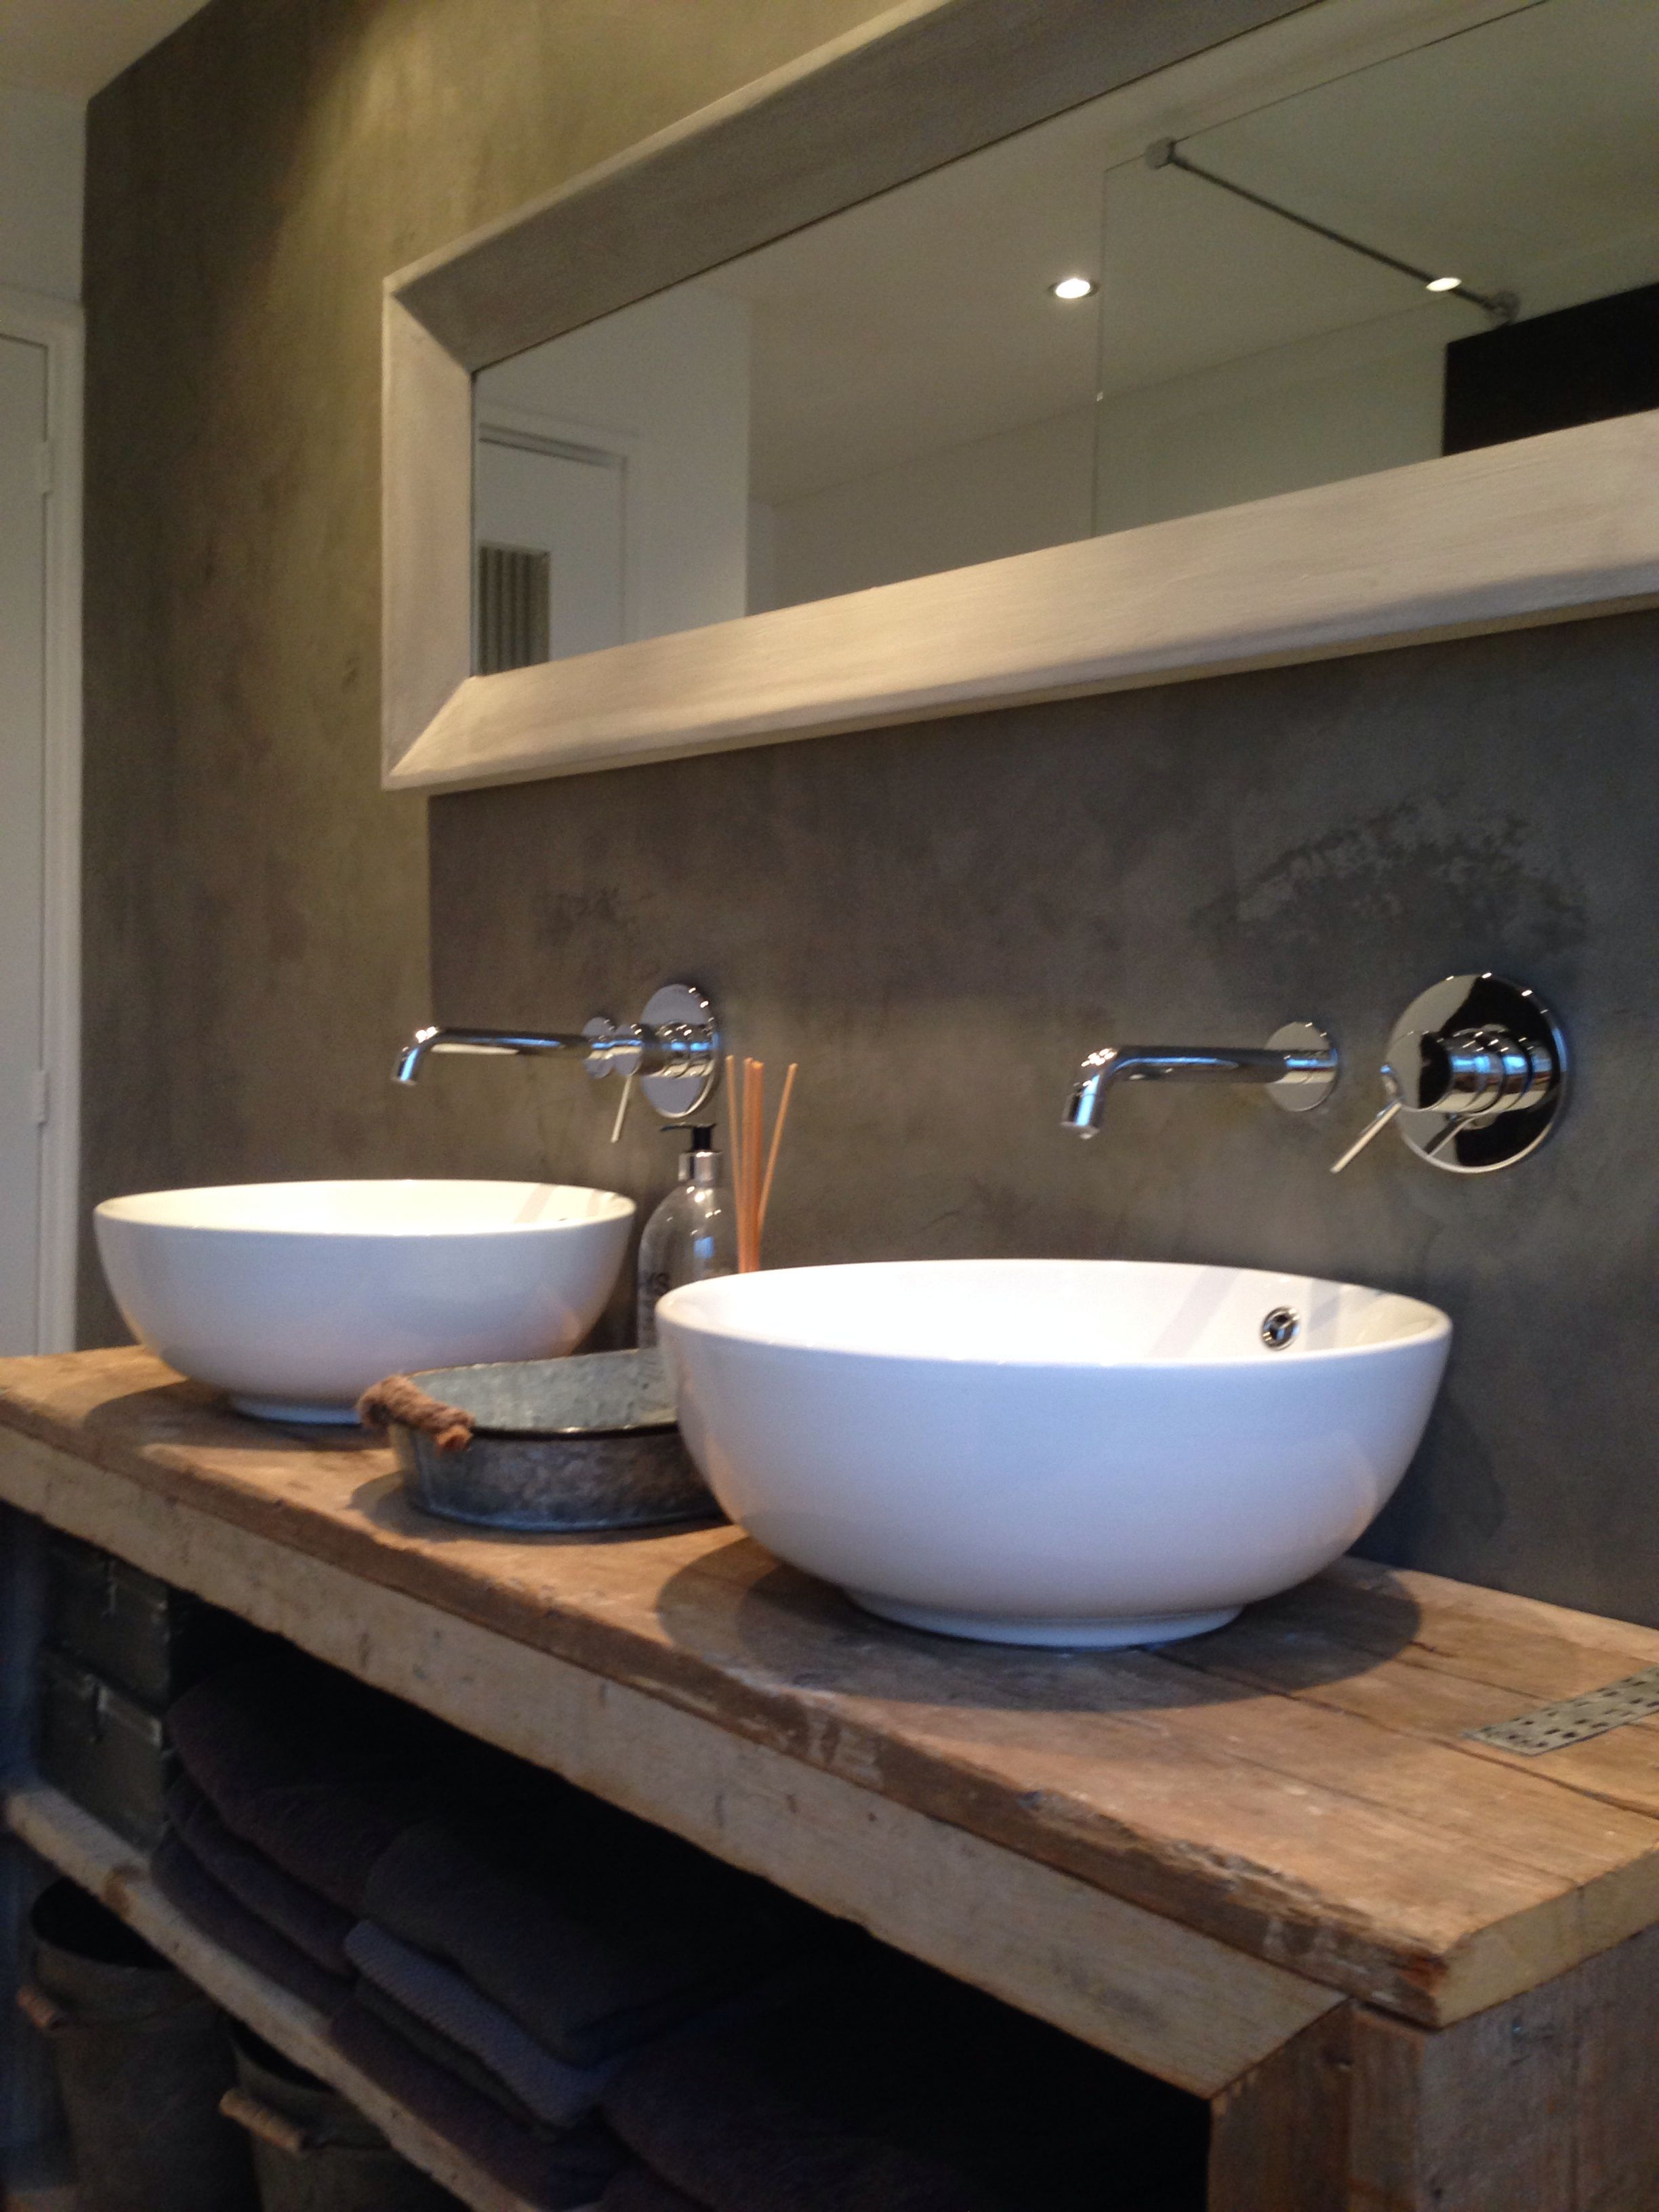 Badezimmerdesigns 8 x 6 bathroom  restroom  salle de bain  uaubudu  cuarto